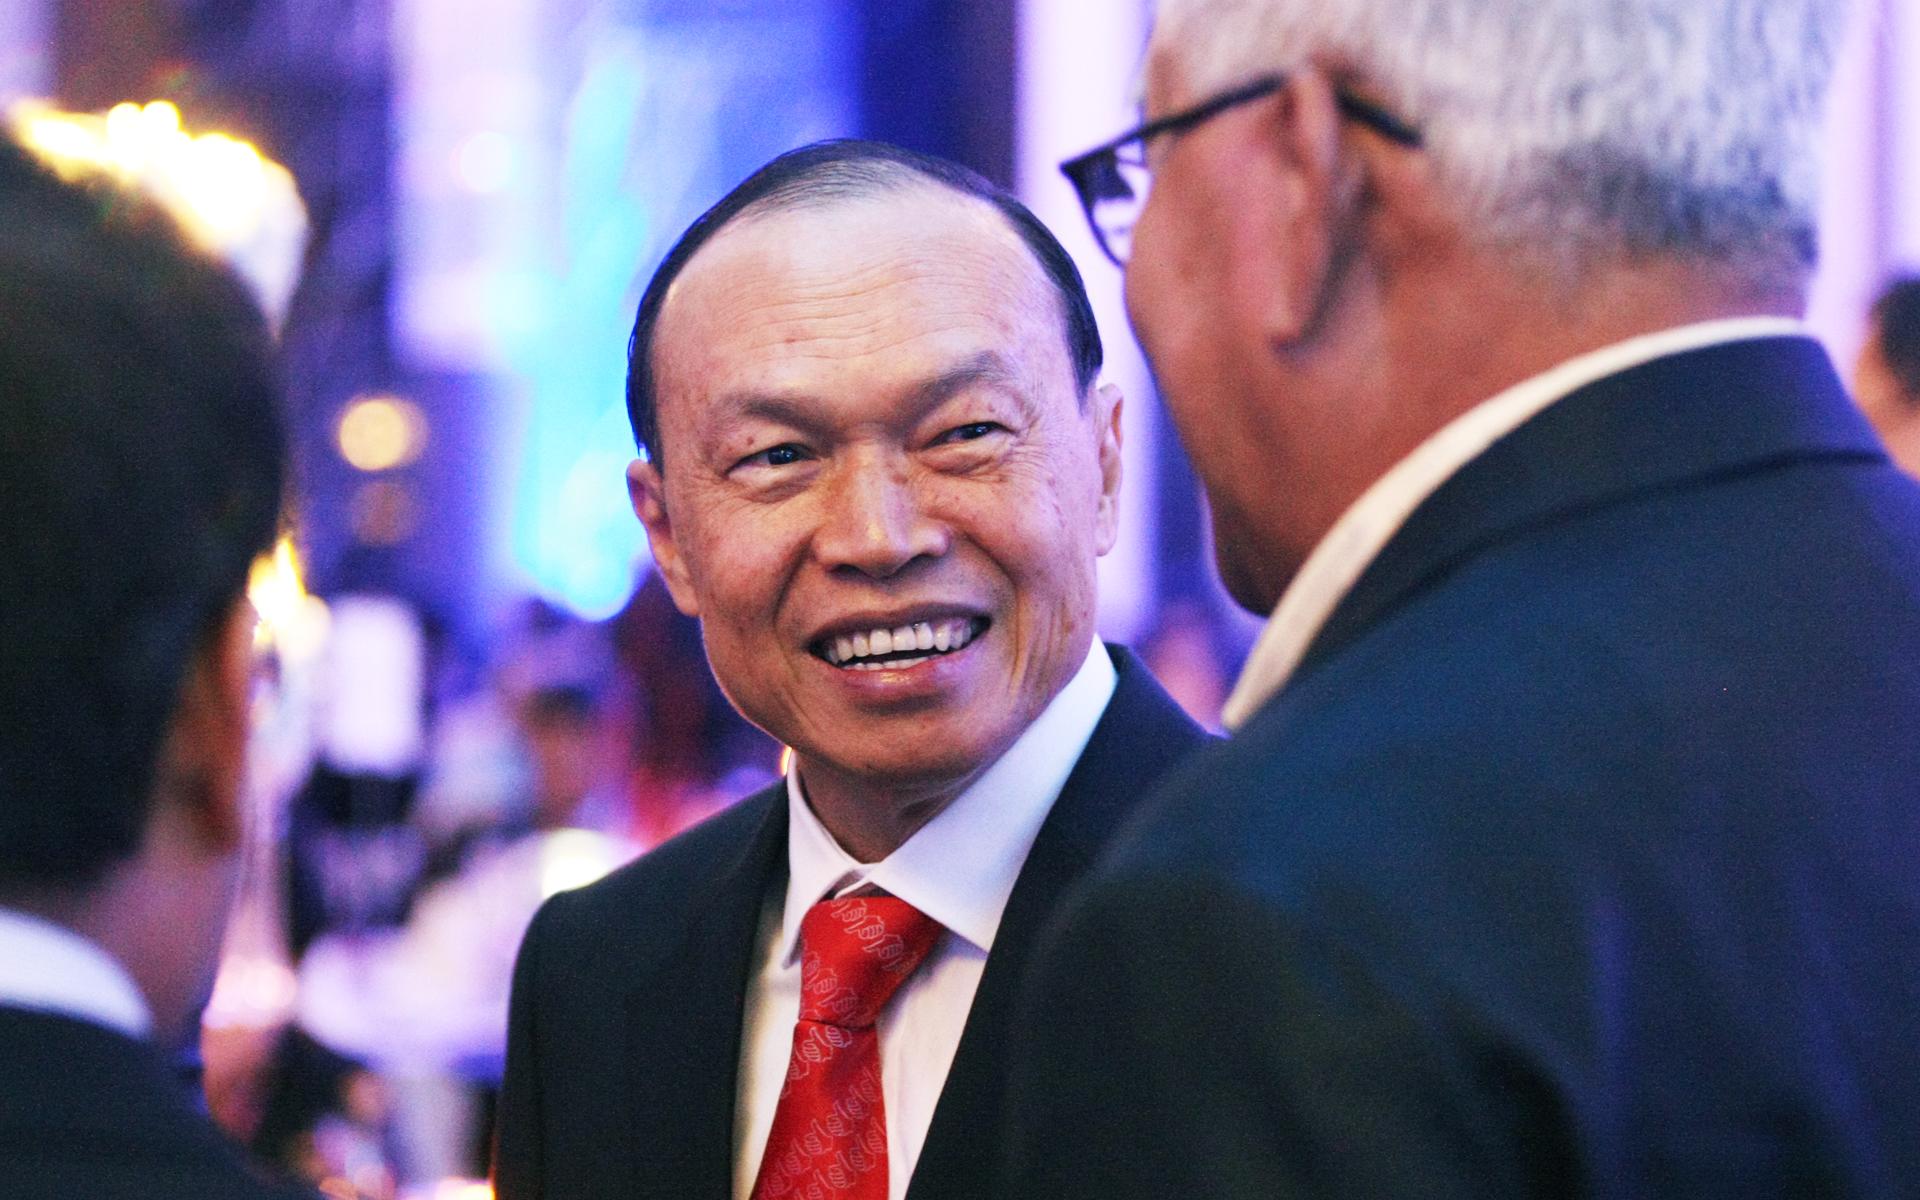 Tan Sri Lim Wee Chai